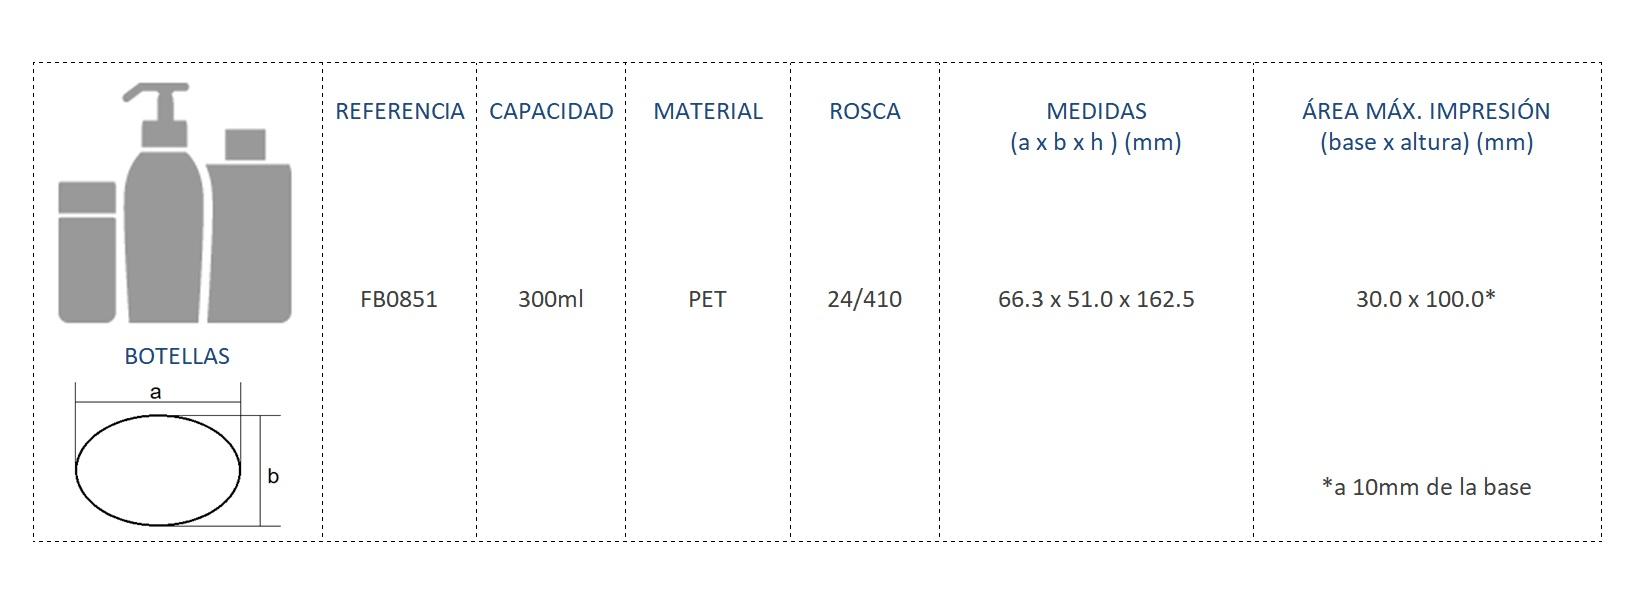 Cuadro de materiales botella FB0851